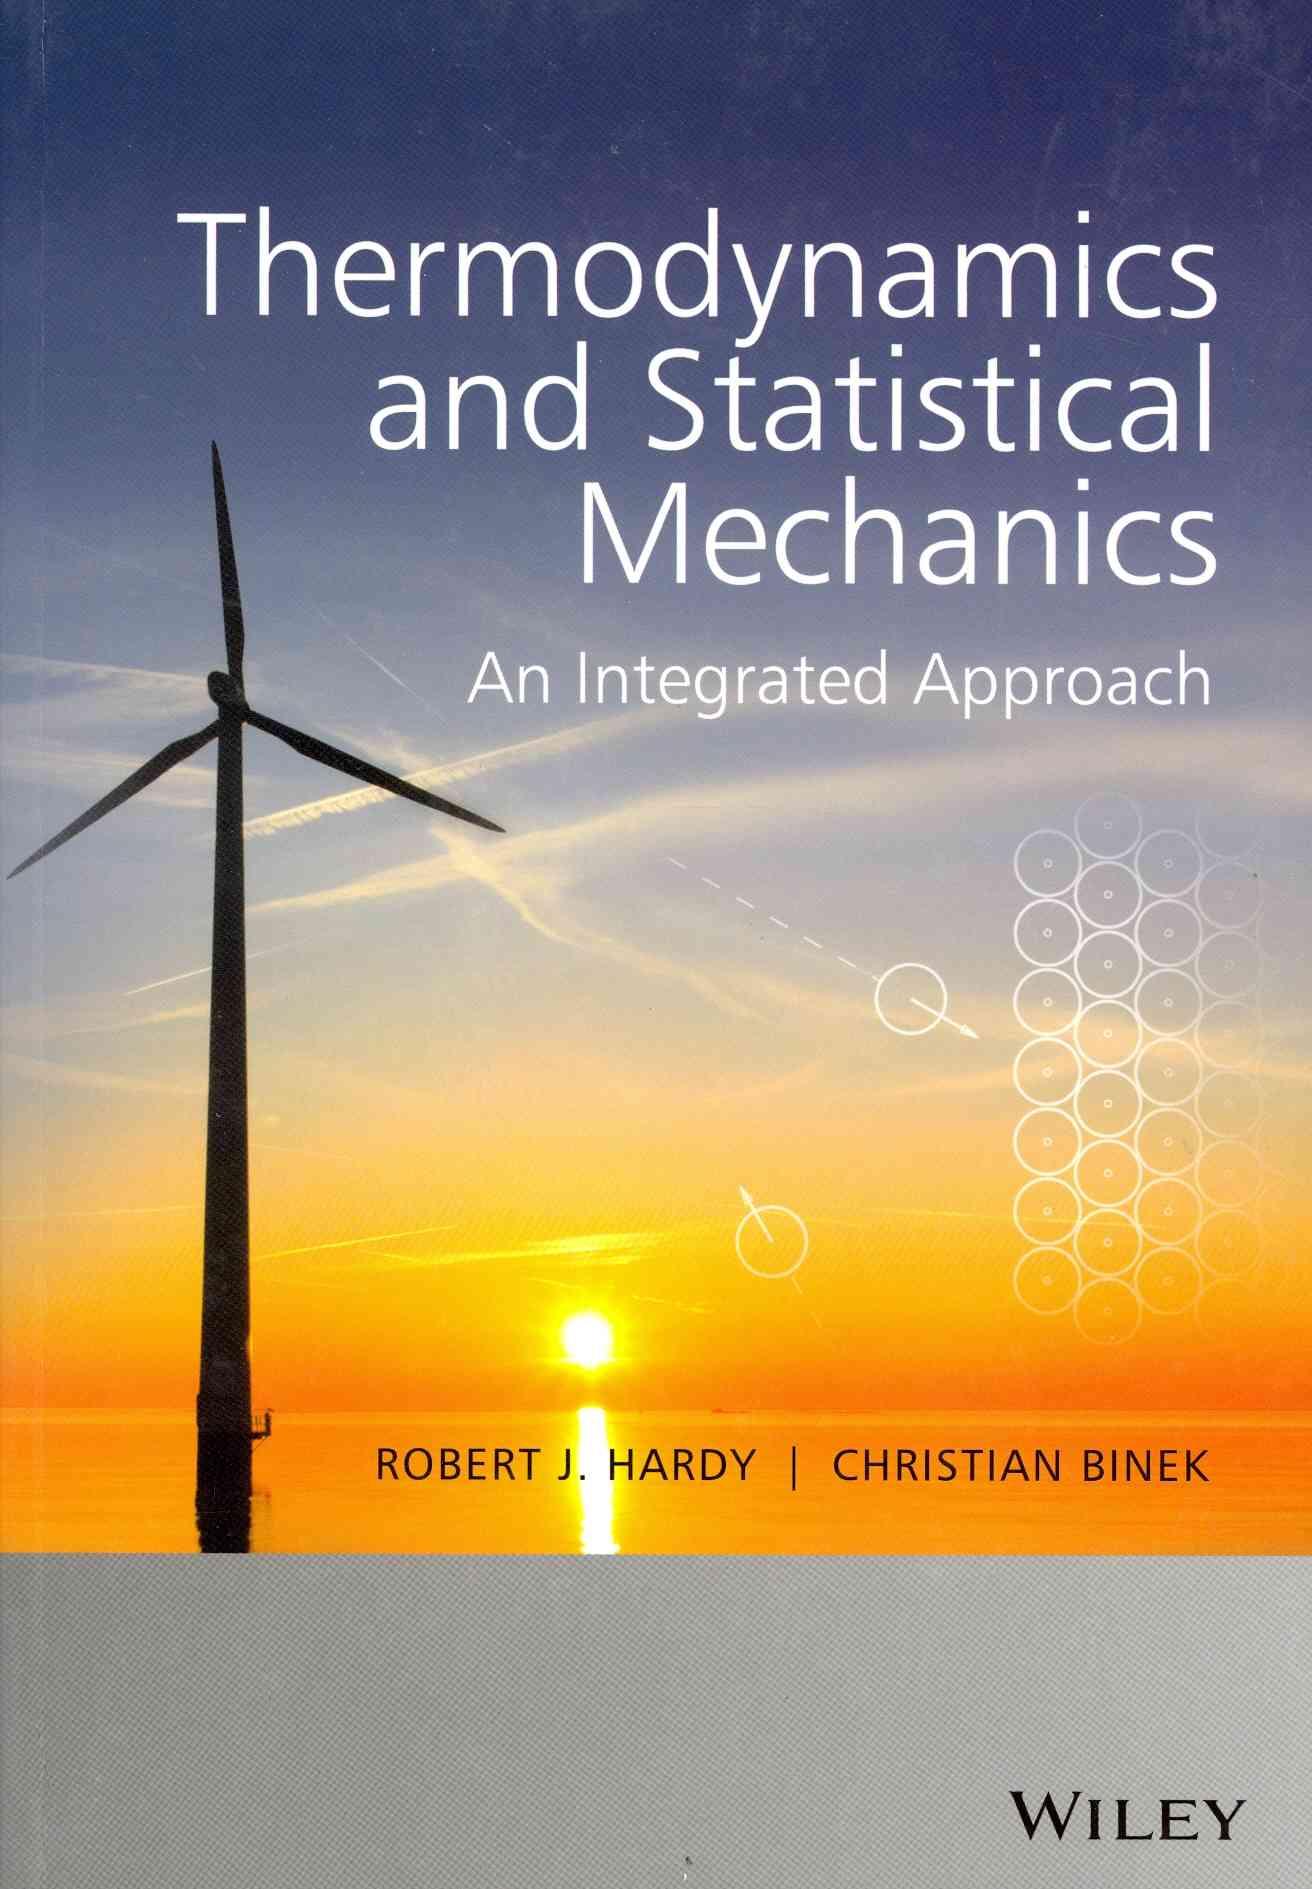 Thermodynamics and Statistical Mechanics By Hardy, Robert J./ Binek, Christian